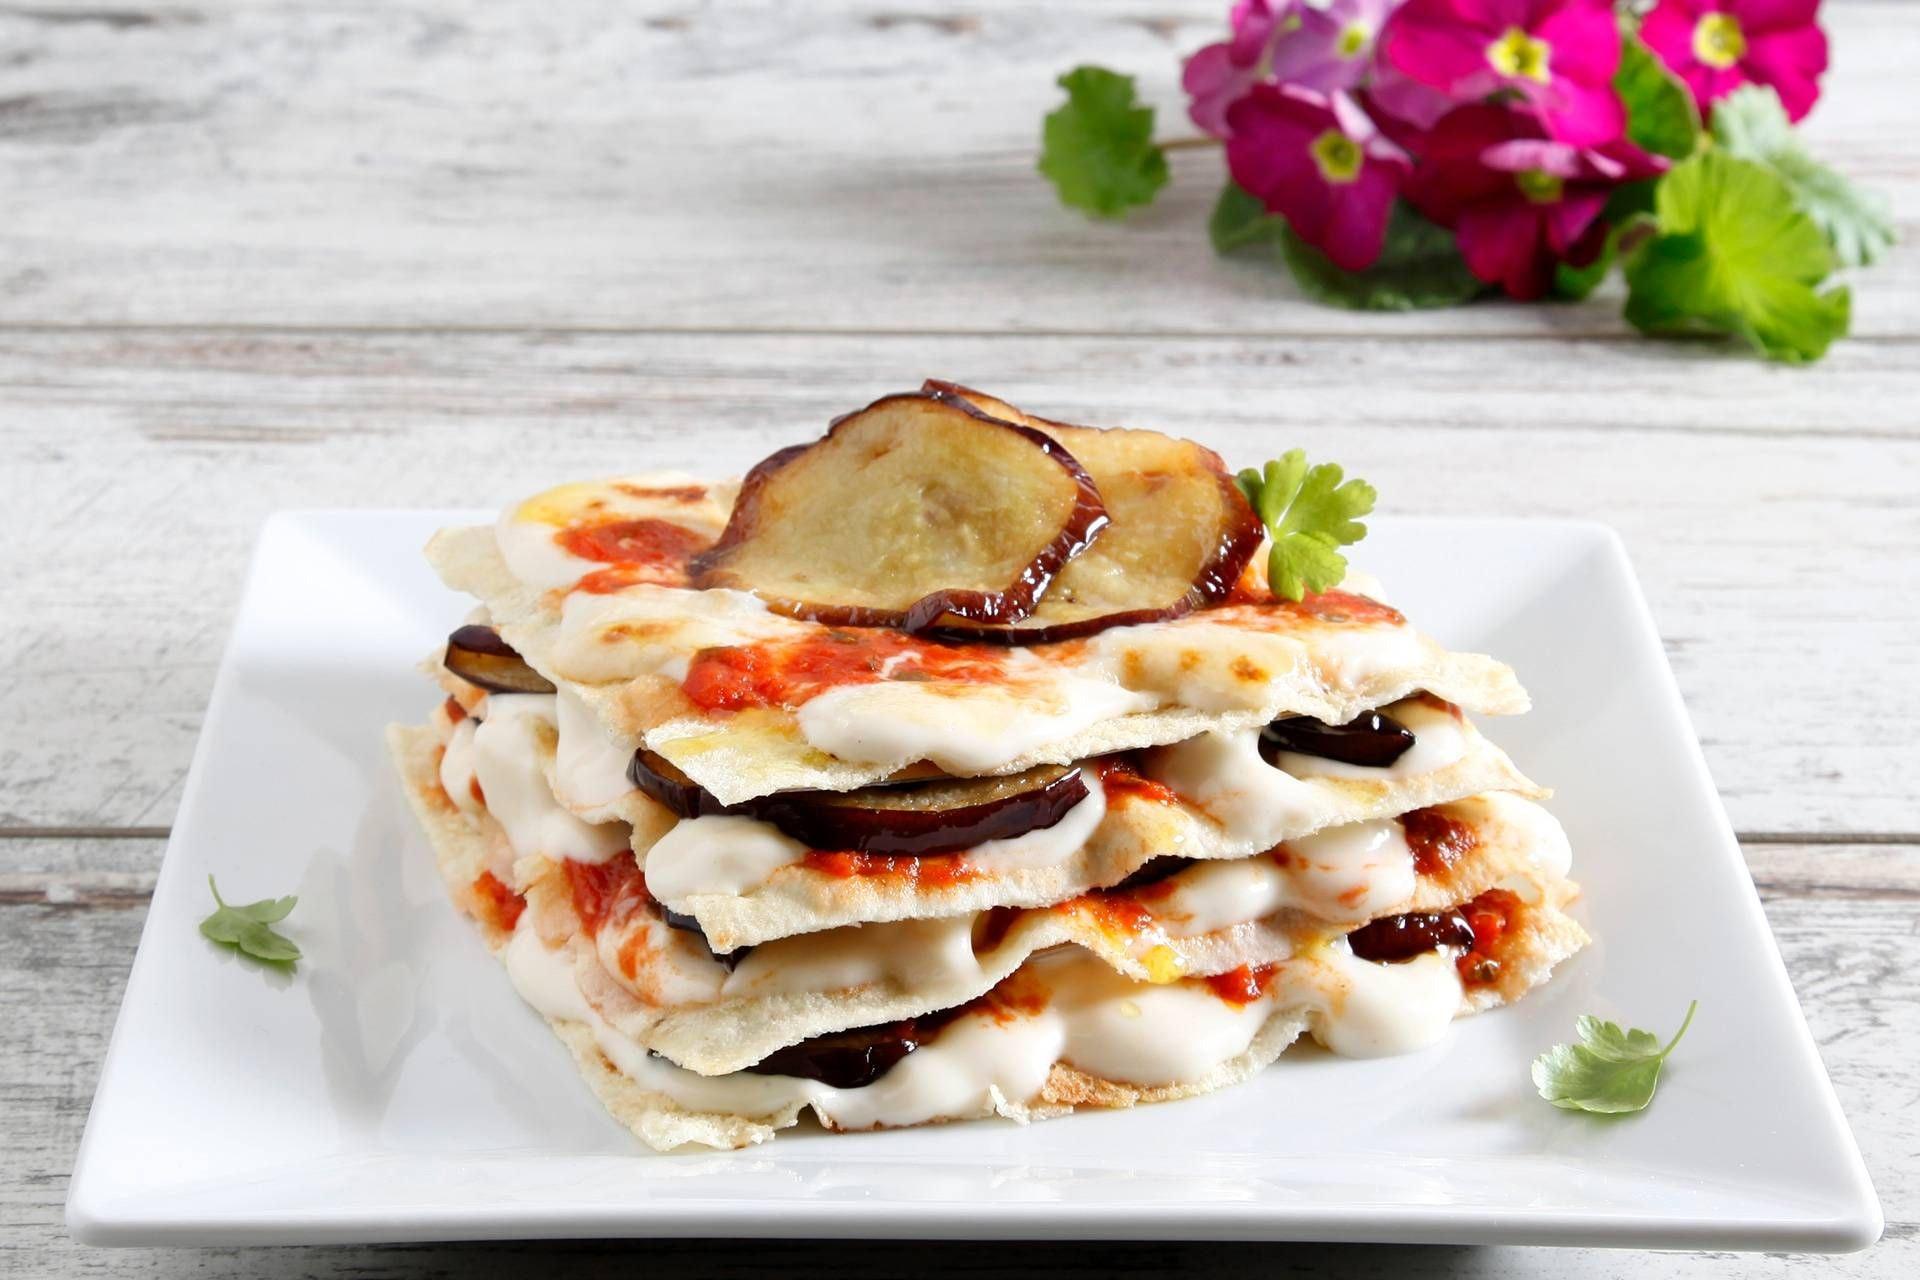 Lasagne di pane carasau - Parmalat